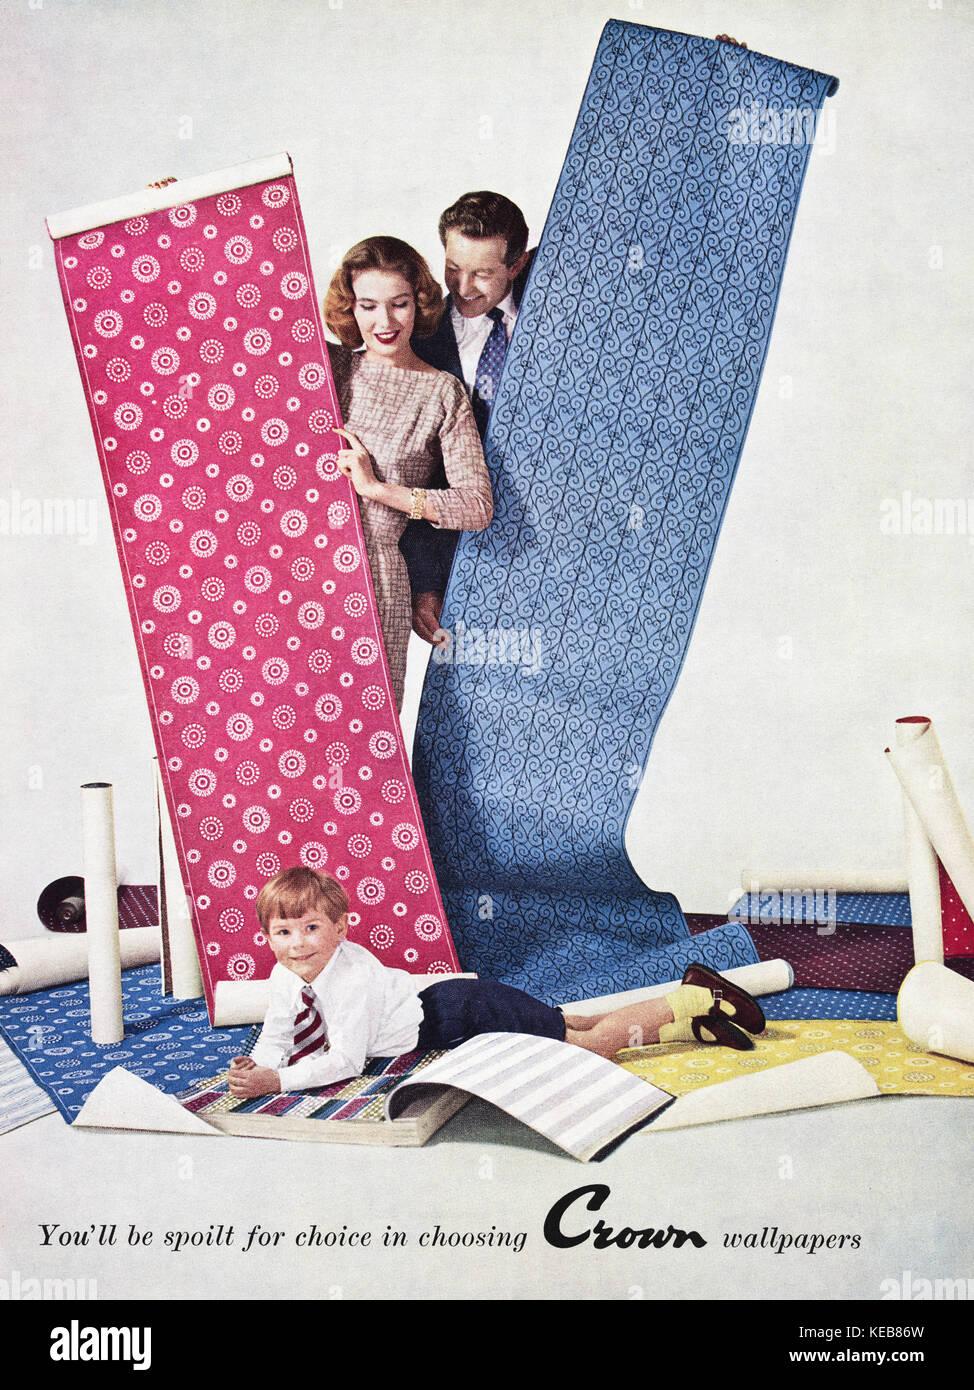 1950s advert old vintage original british magazine advertisement advertising Crown Wallpaper dated 1958 - Stock Image